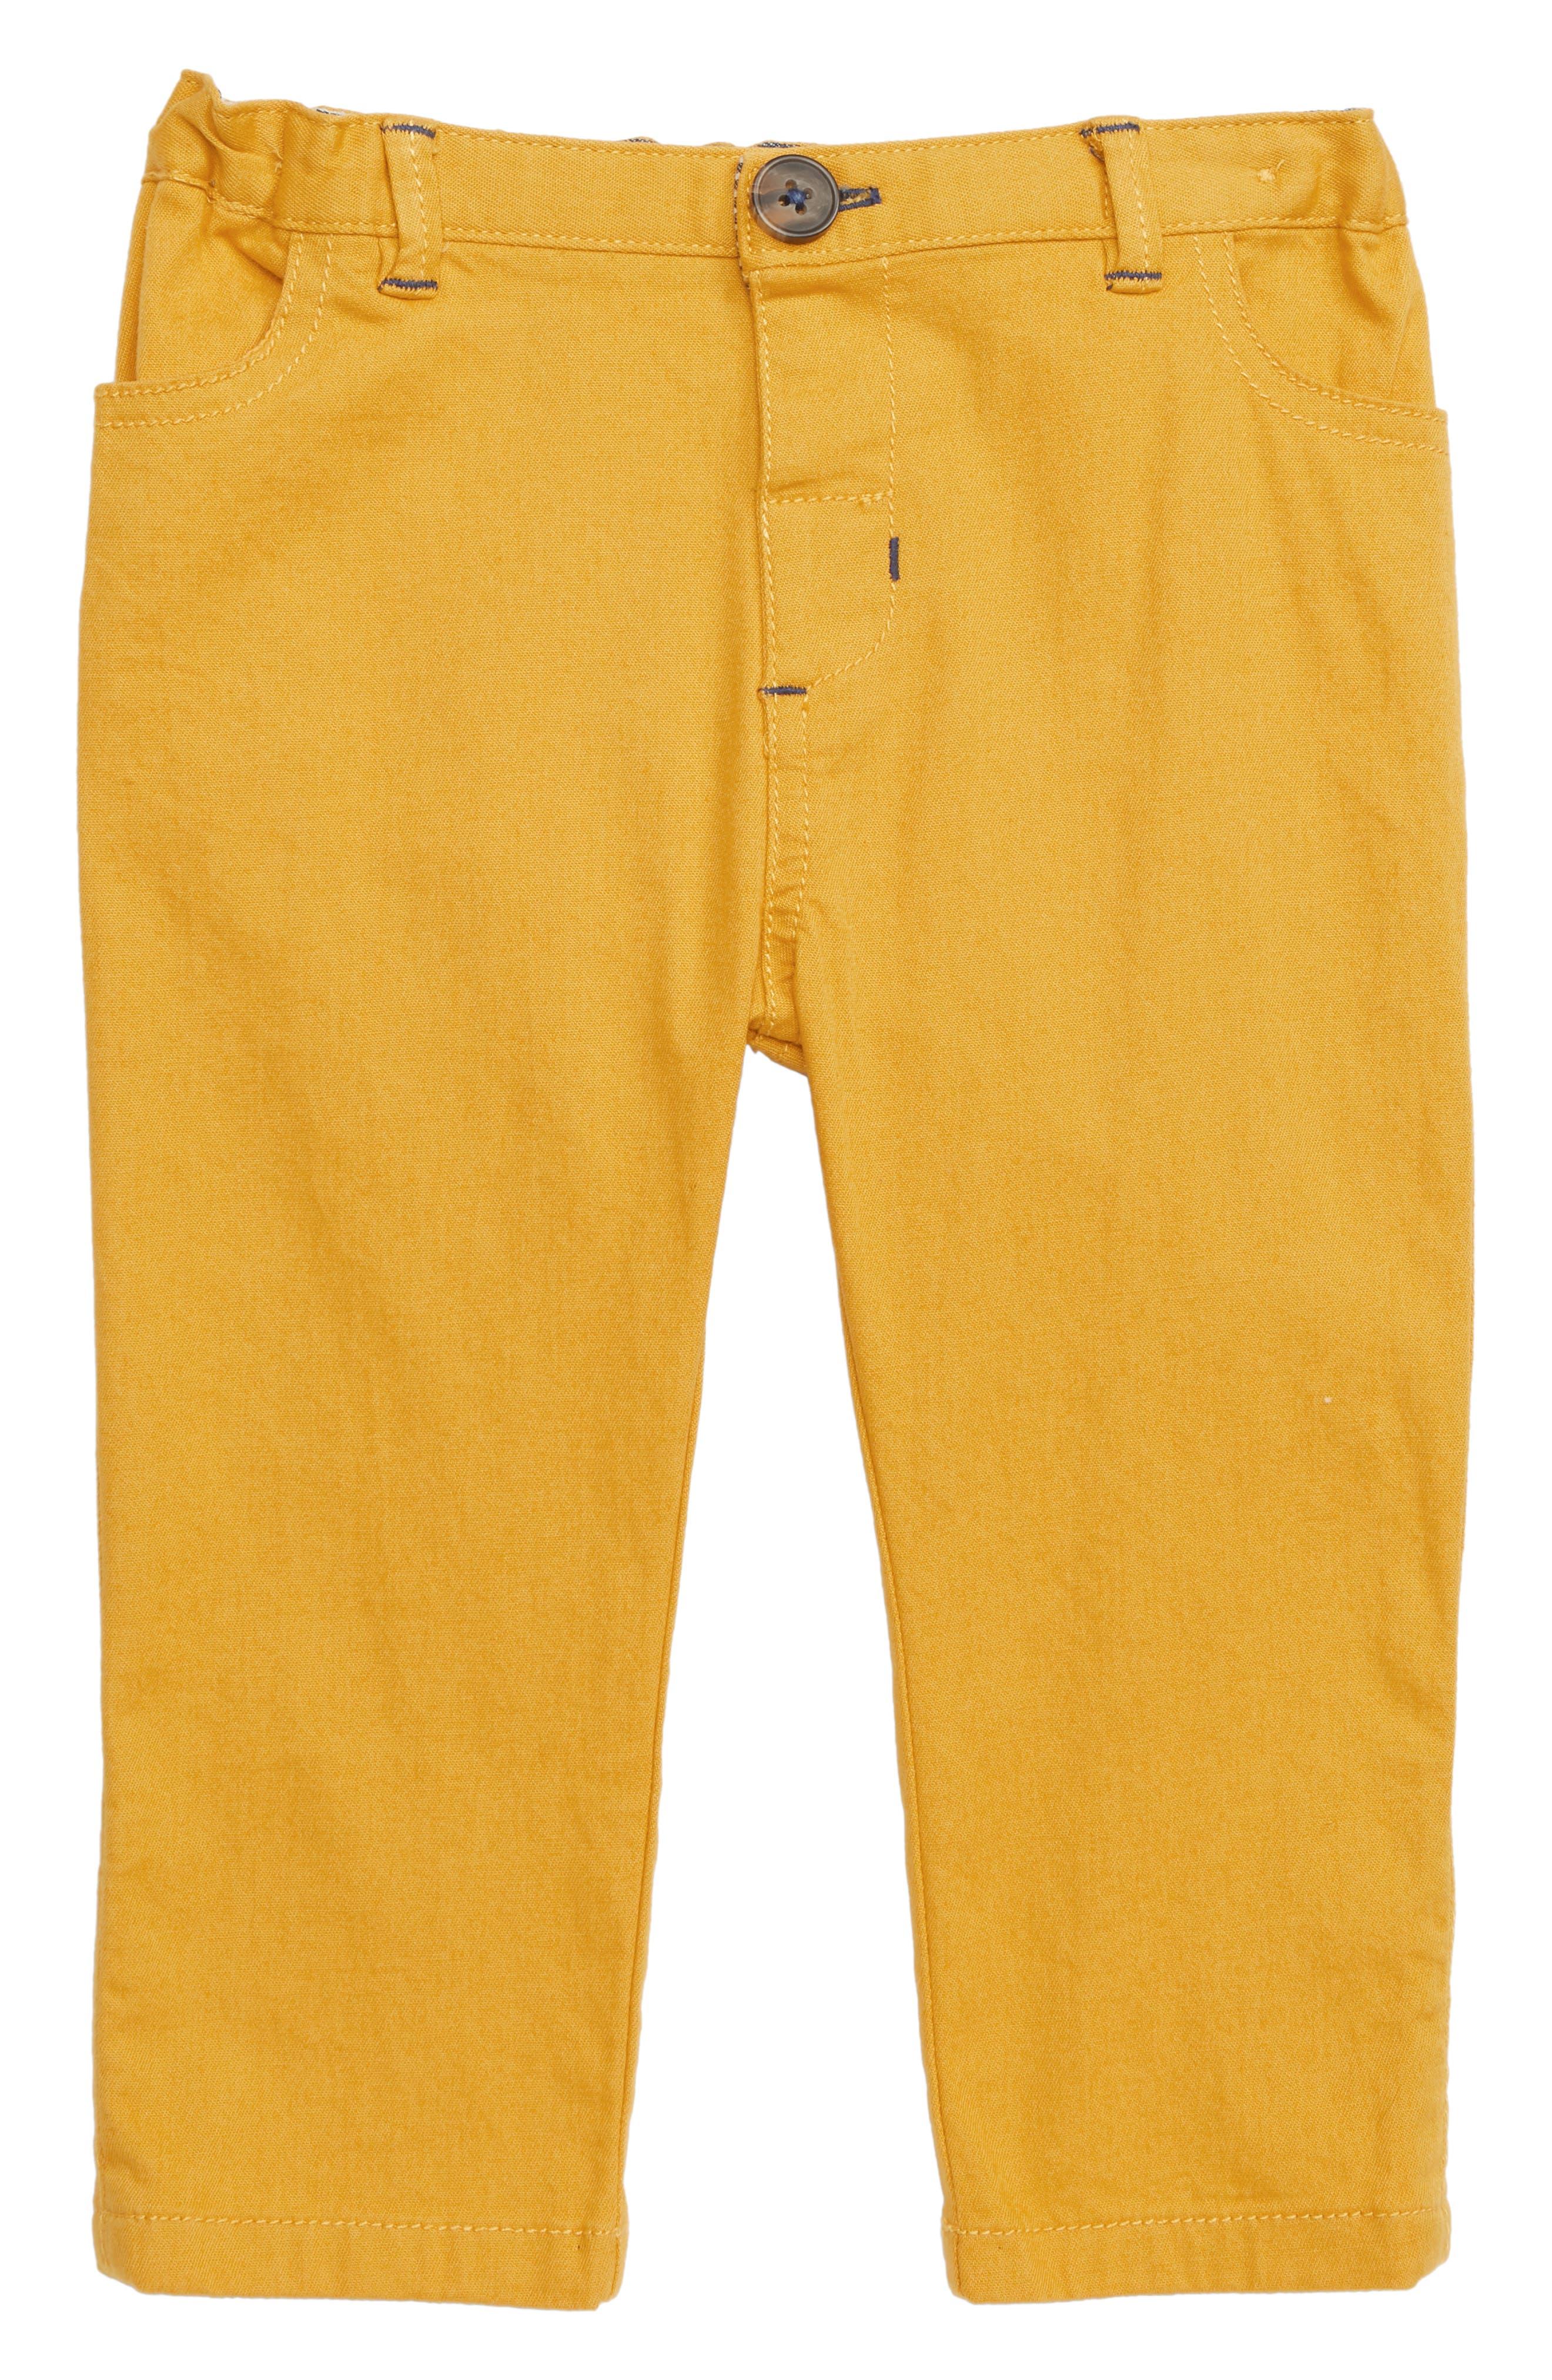 MINI BODEN,                             Colorful Chino Pants,                             Main thumbnail 1, color,                             YEL HONEYCOMB YELLOW